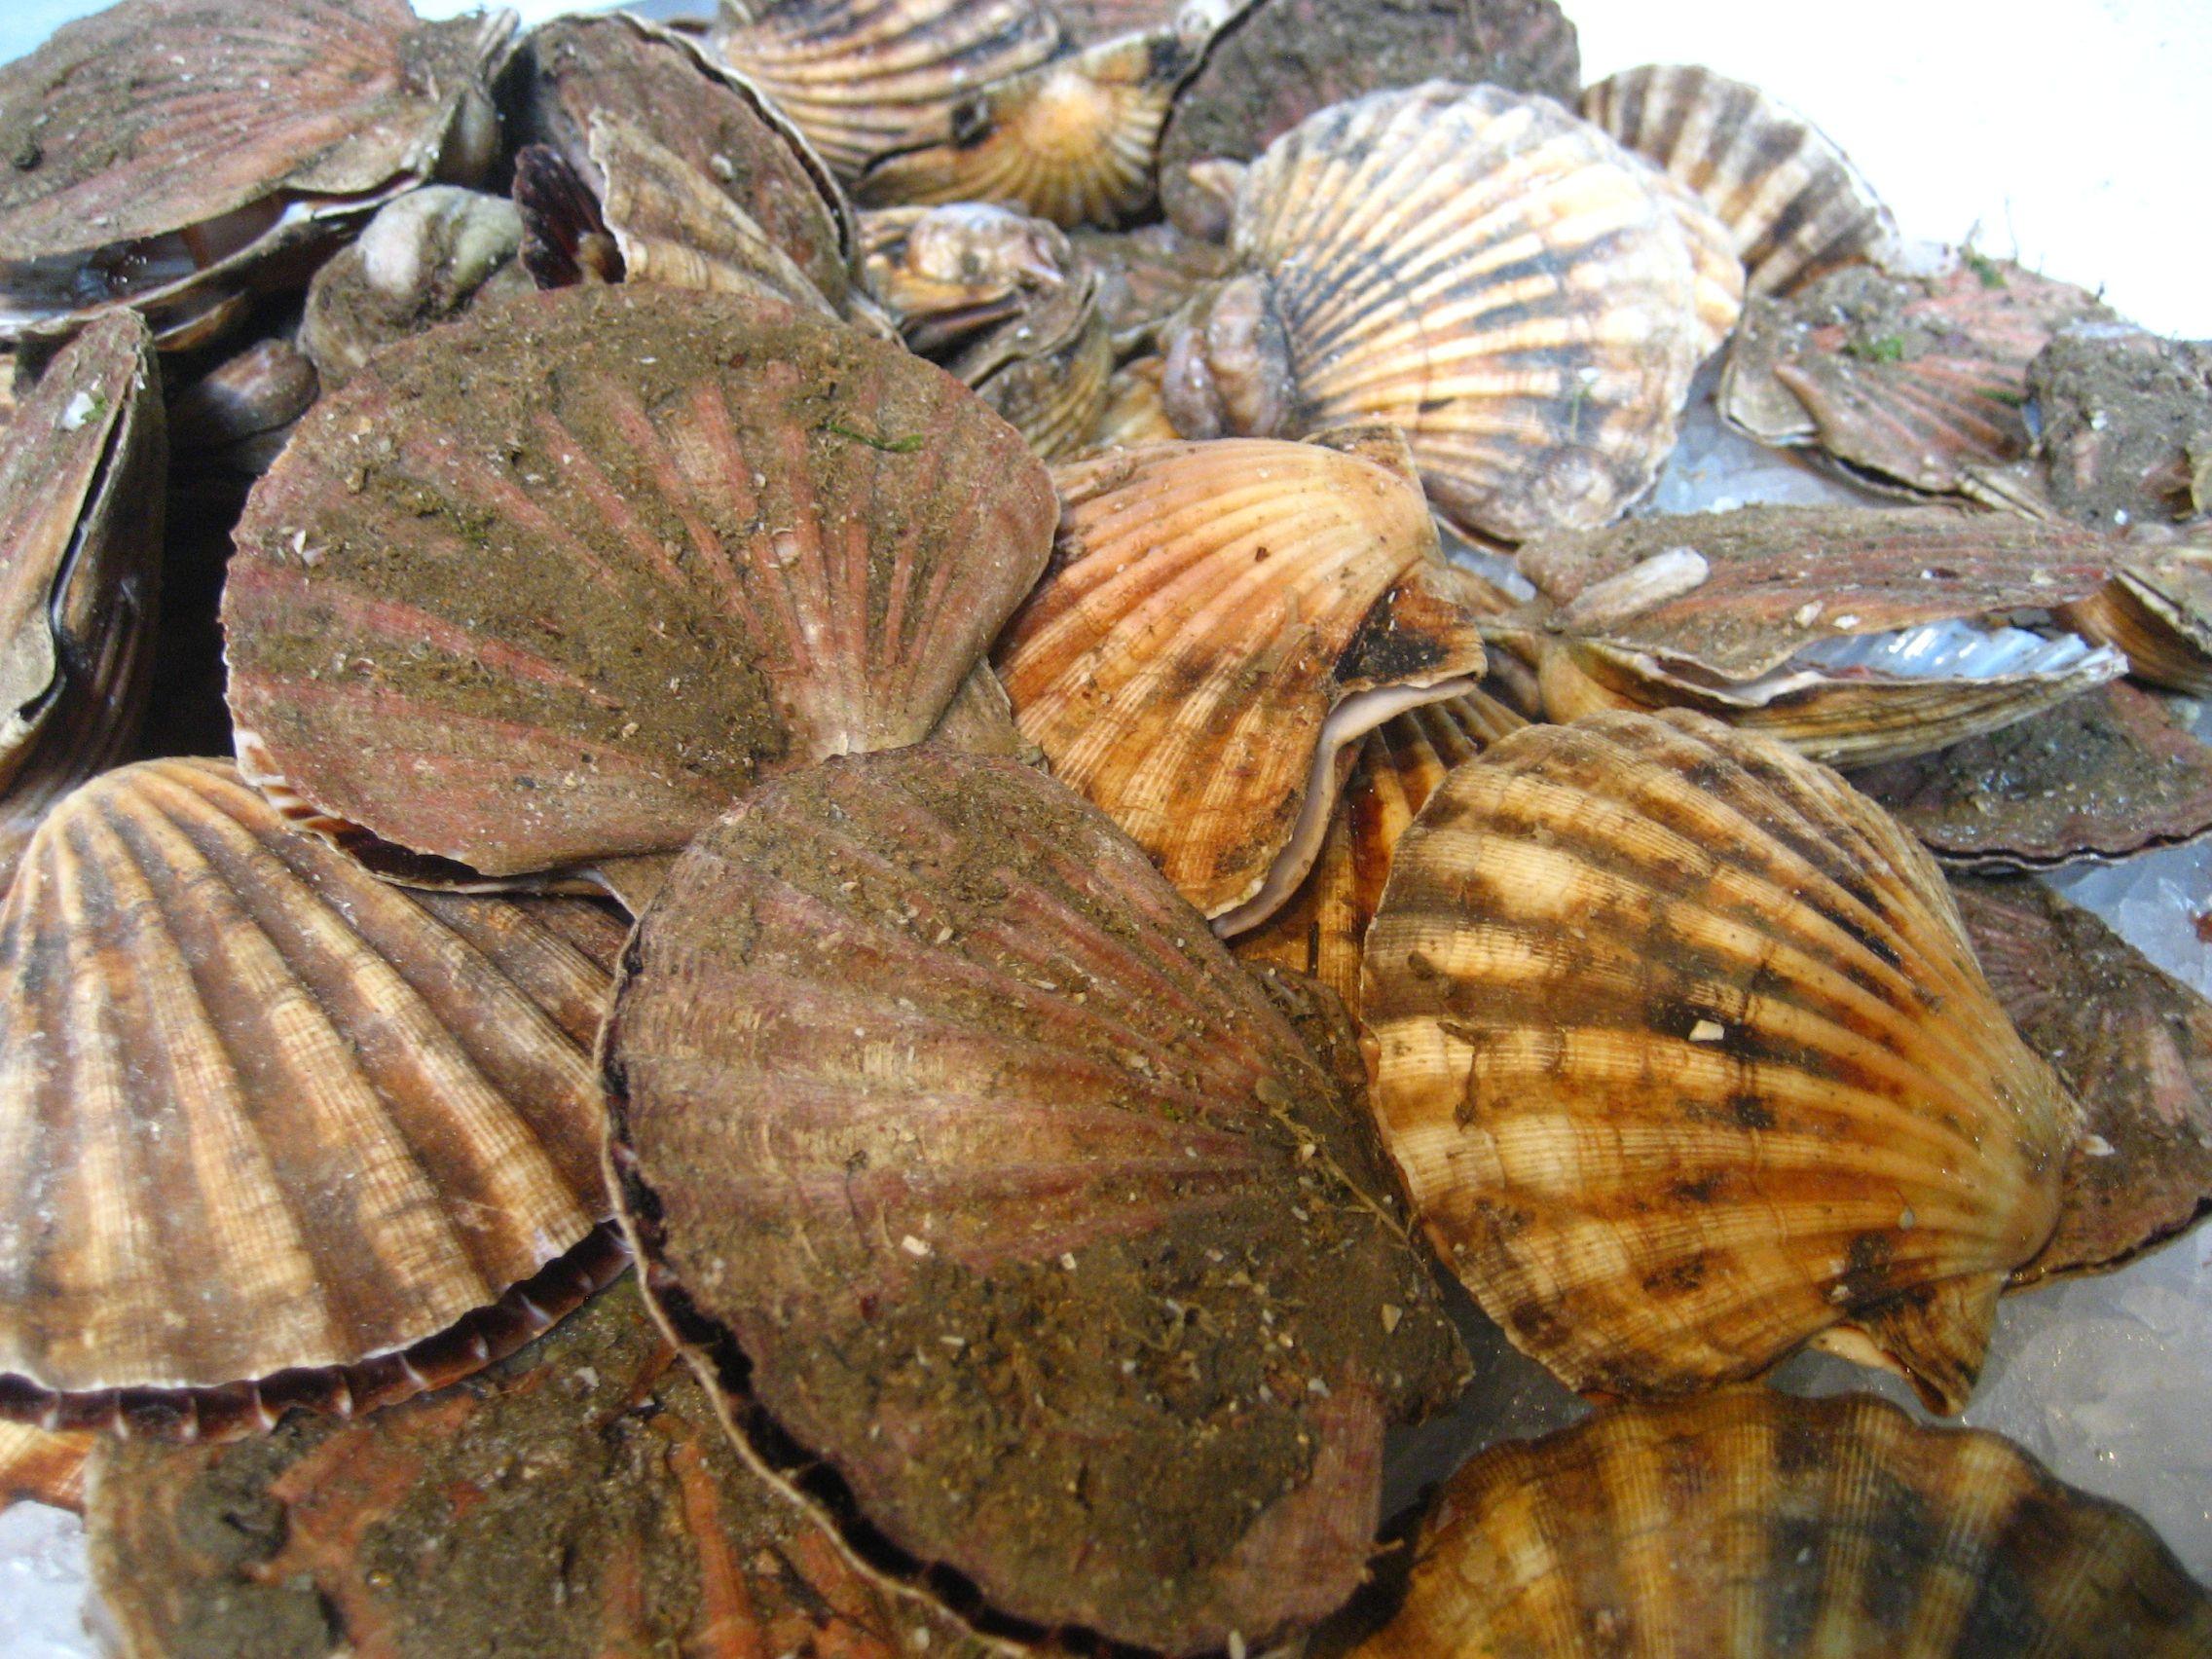 Scallops In The Shell Scallops Seafood Shellfish Food Shellfish Pot Roast Food